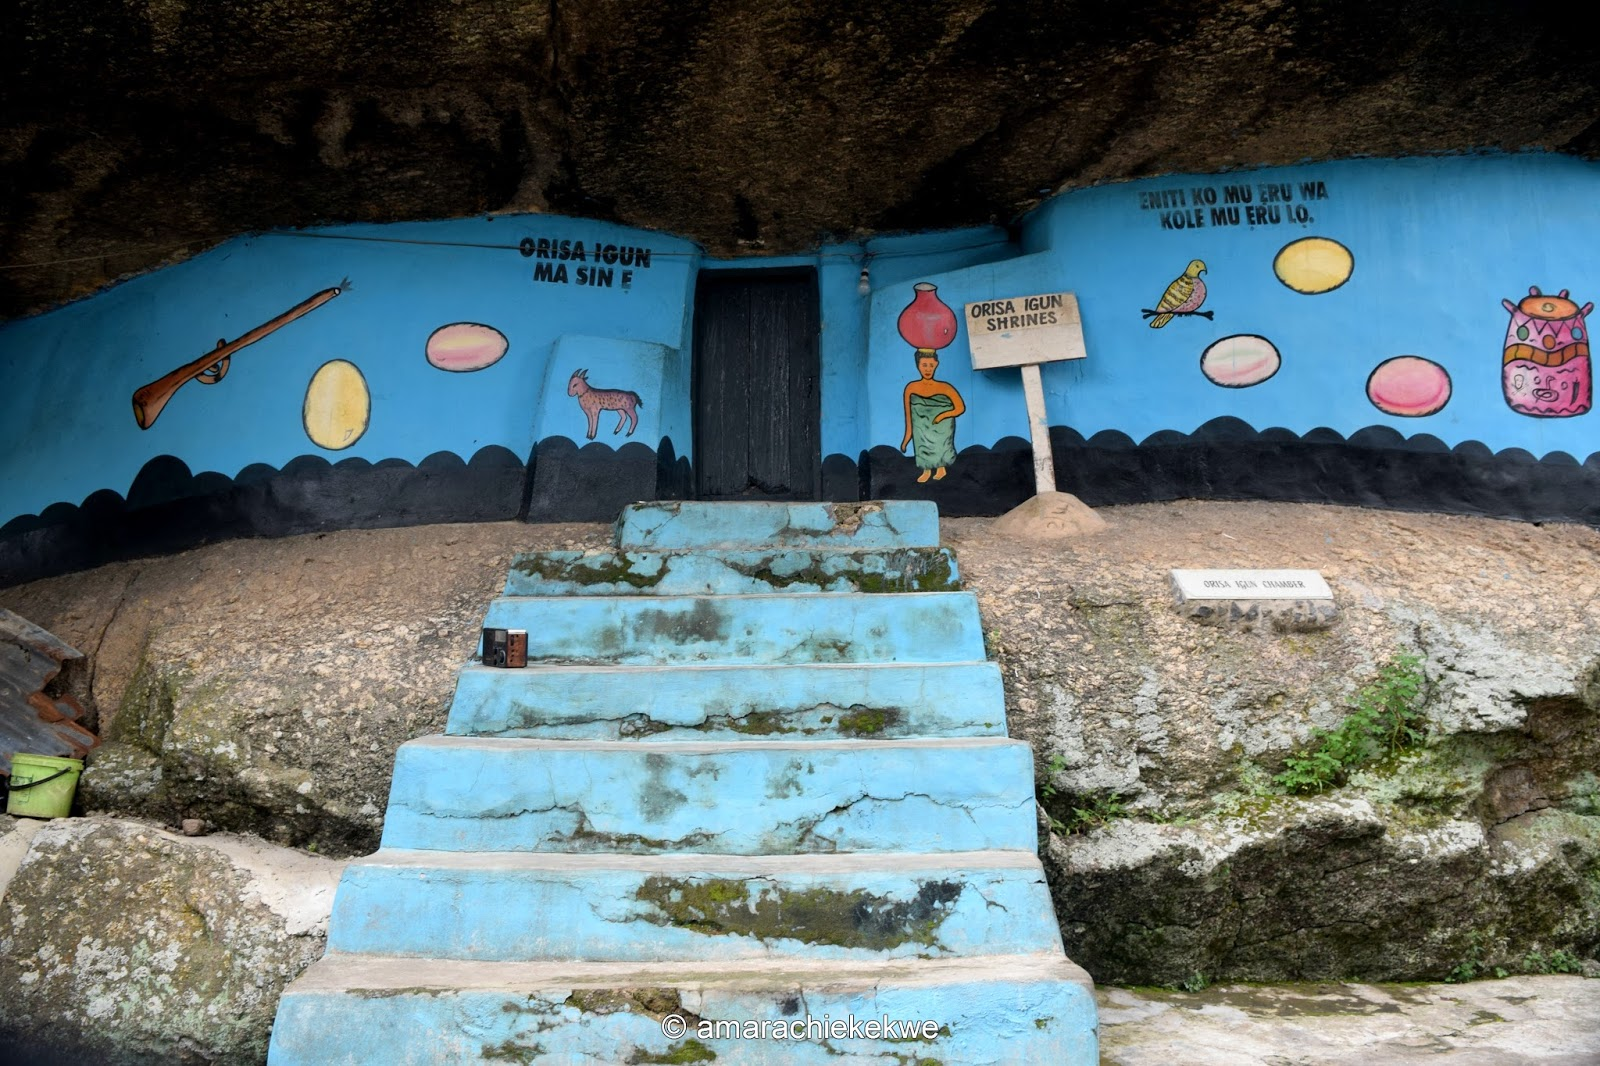 Places to visit in Nigeria - Olumo rock in Abeokuta